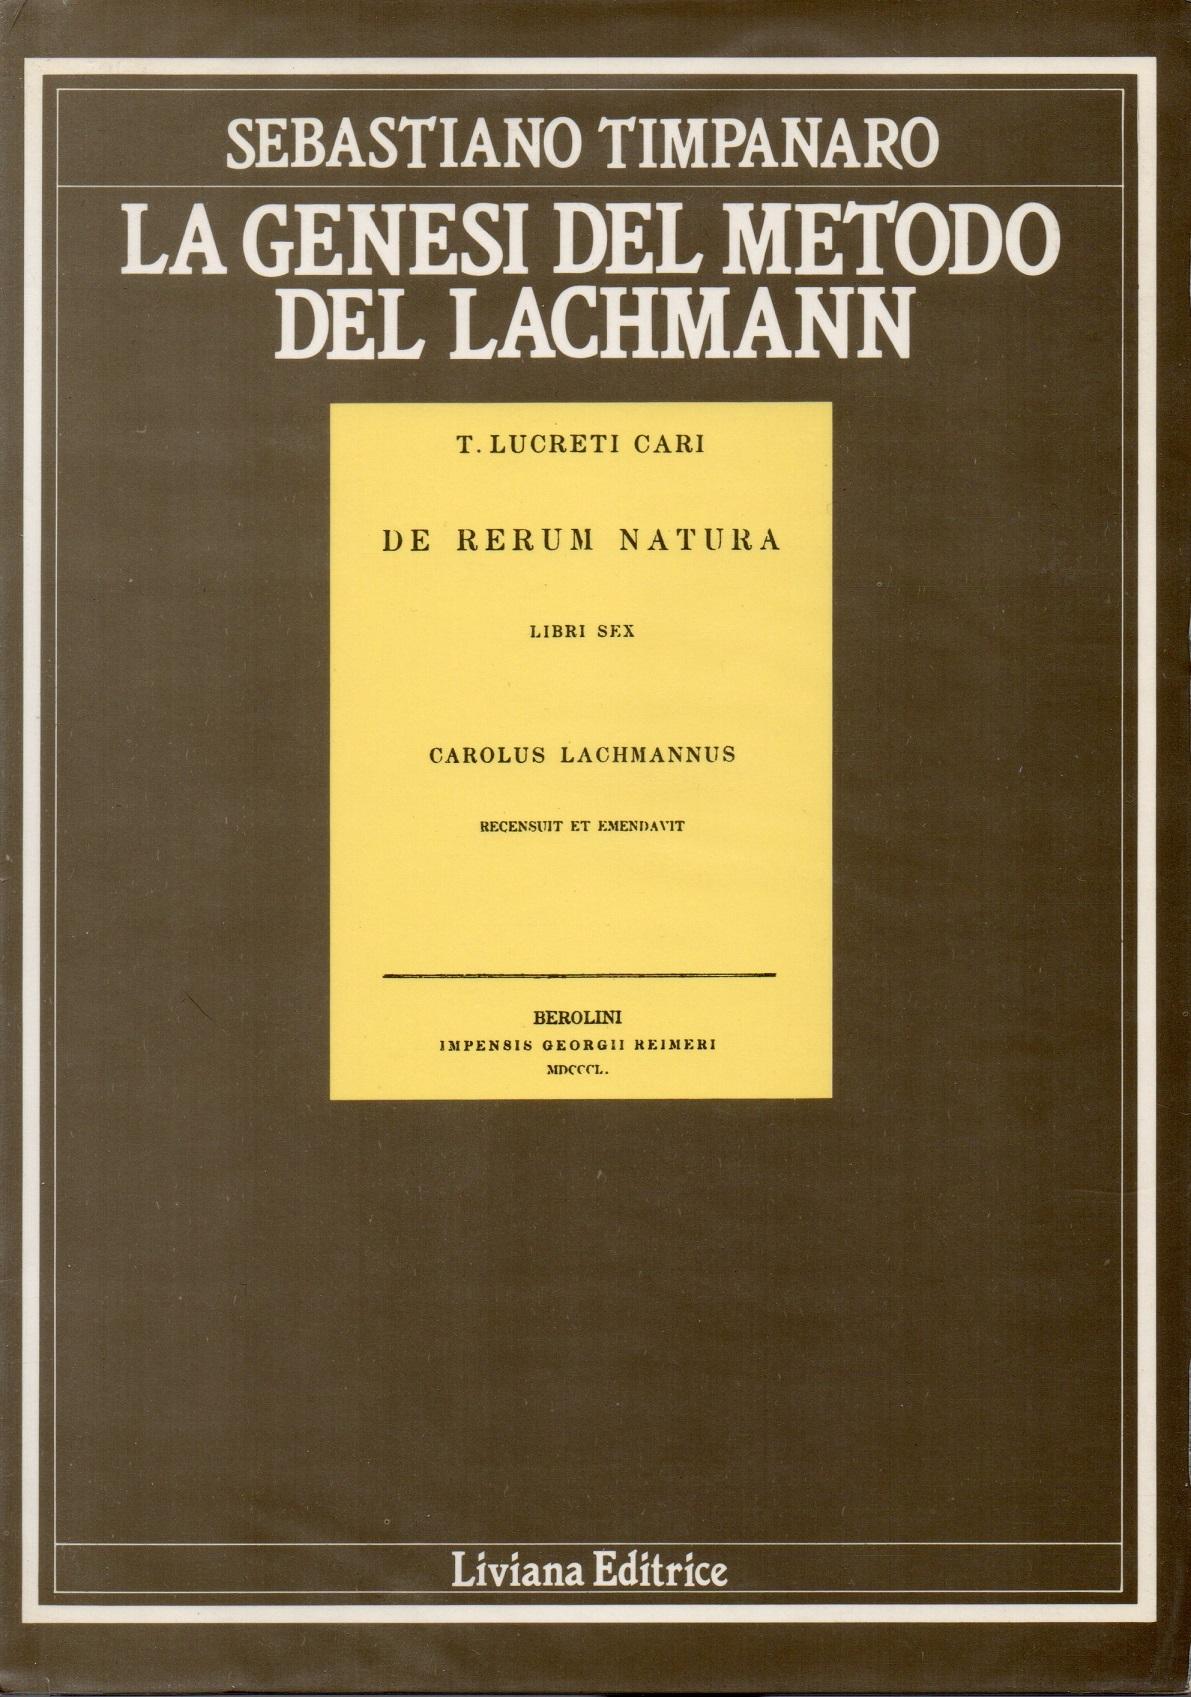 La genesi del metodo del Lachmann